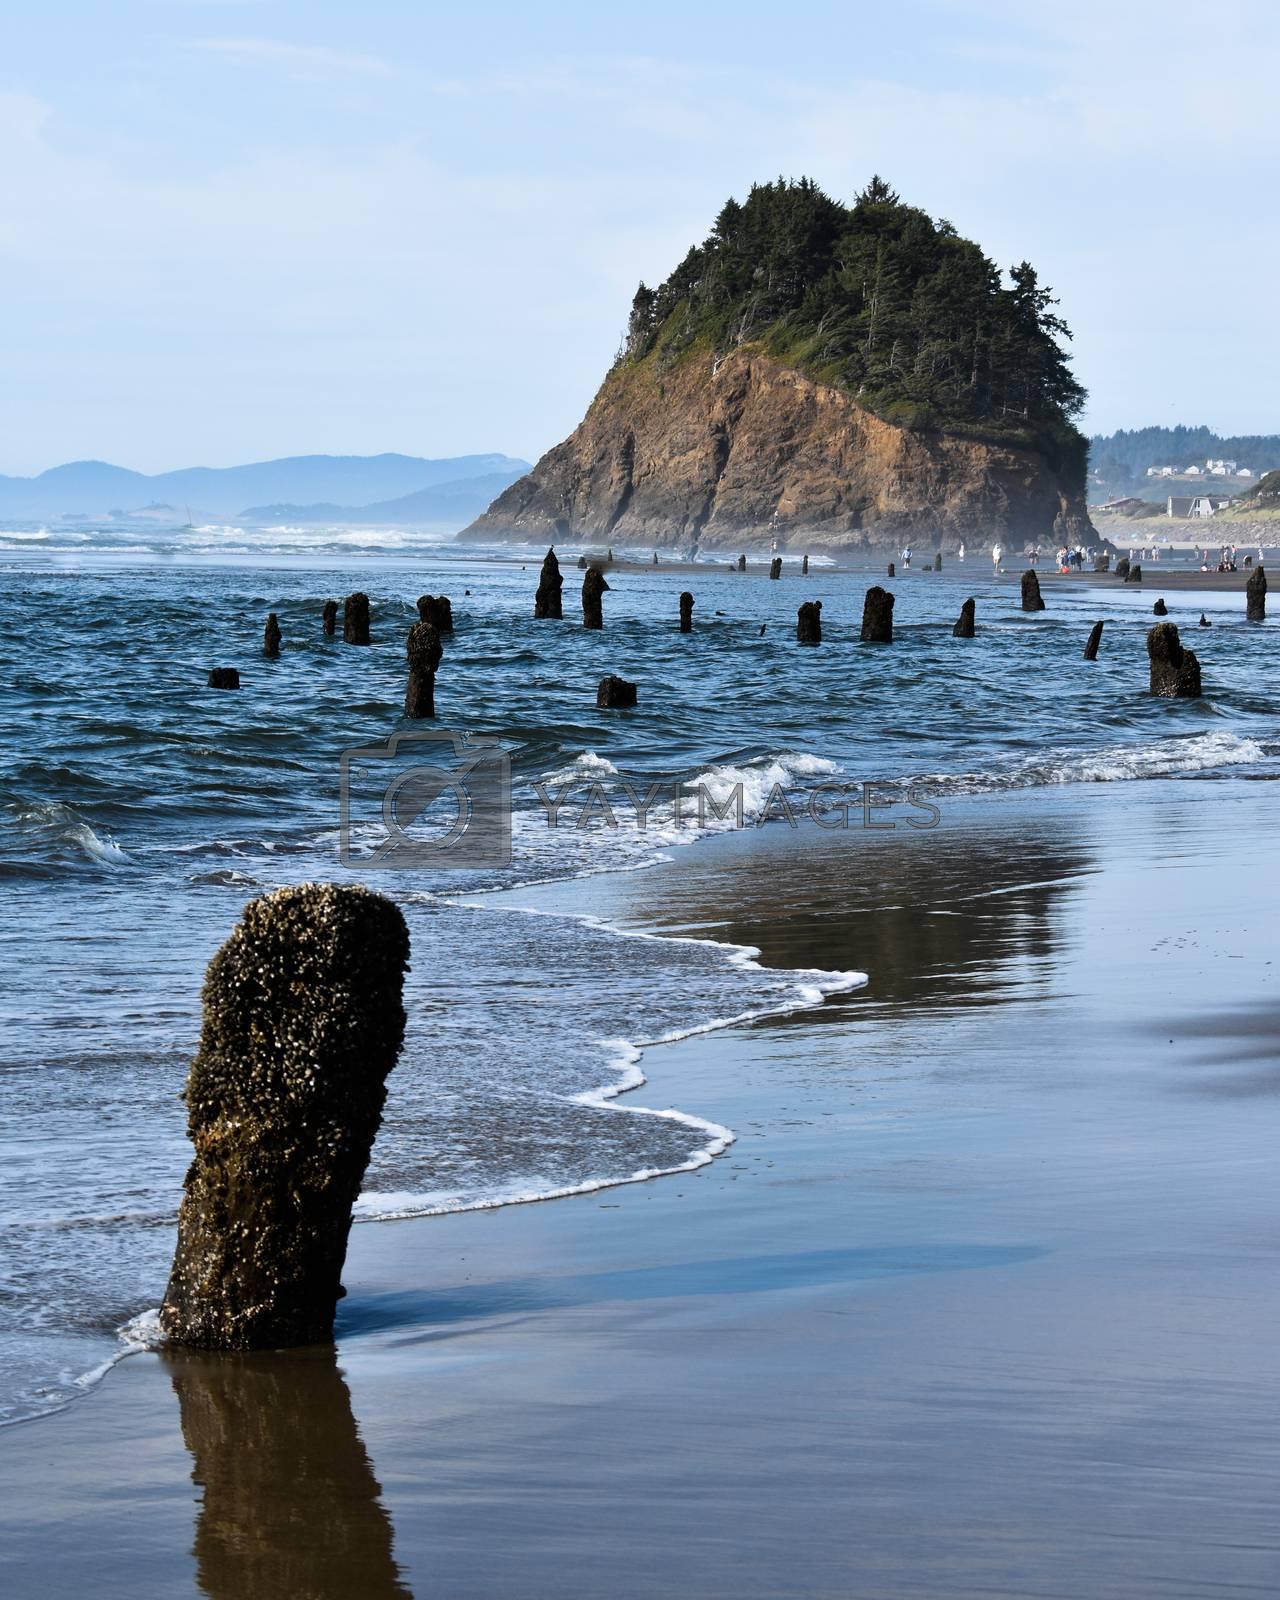 Stumps on a sandy beach on the Oregon Coast